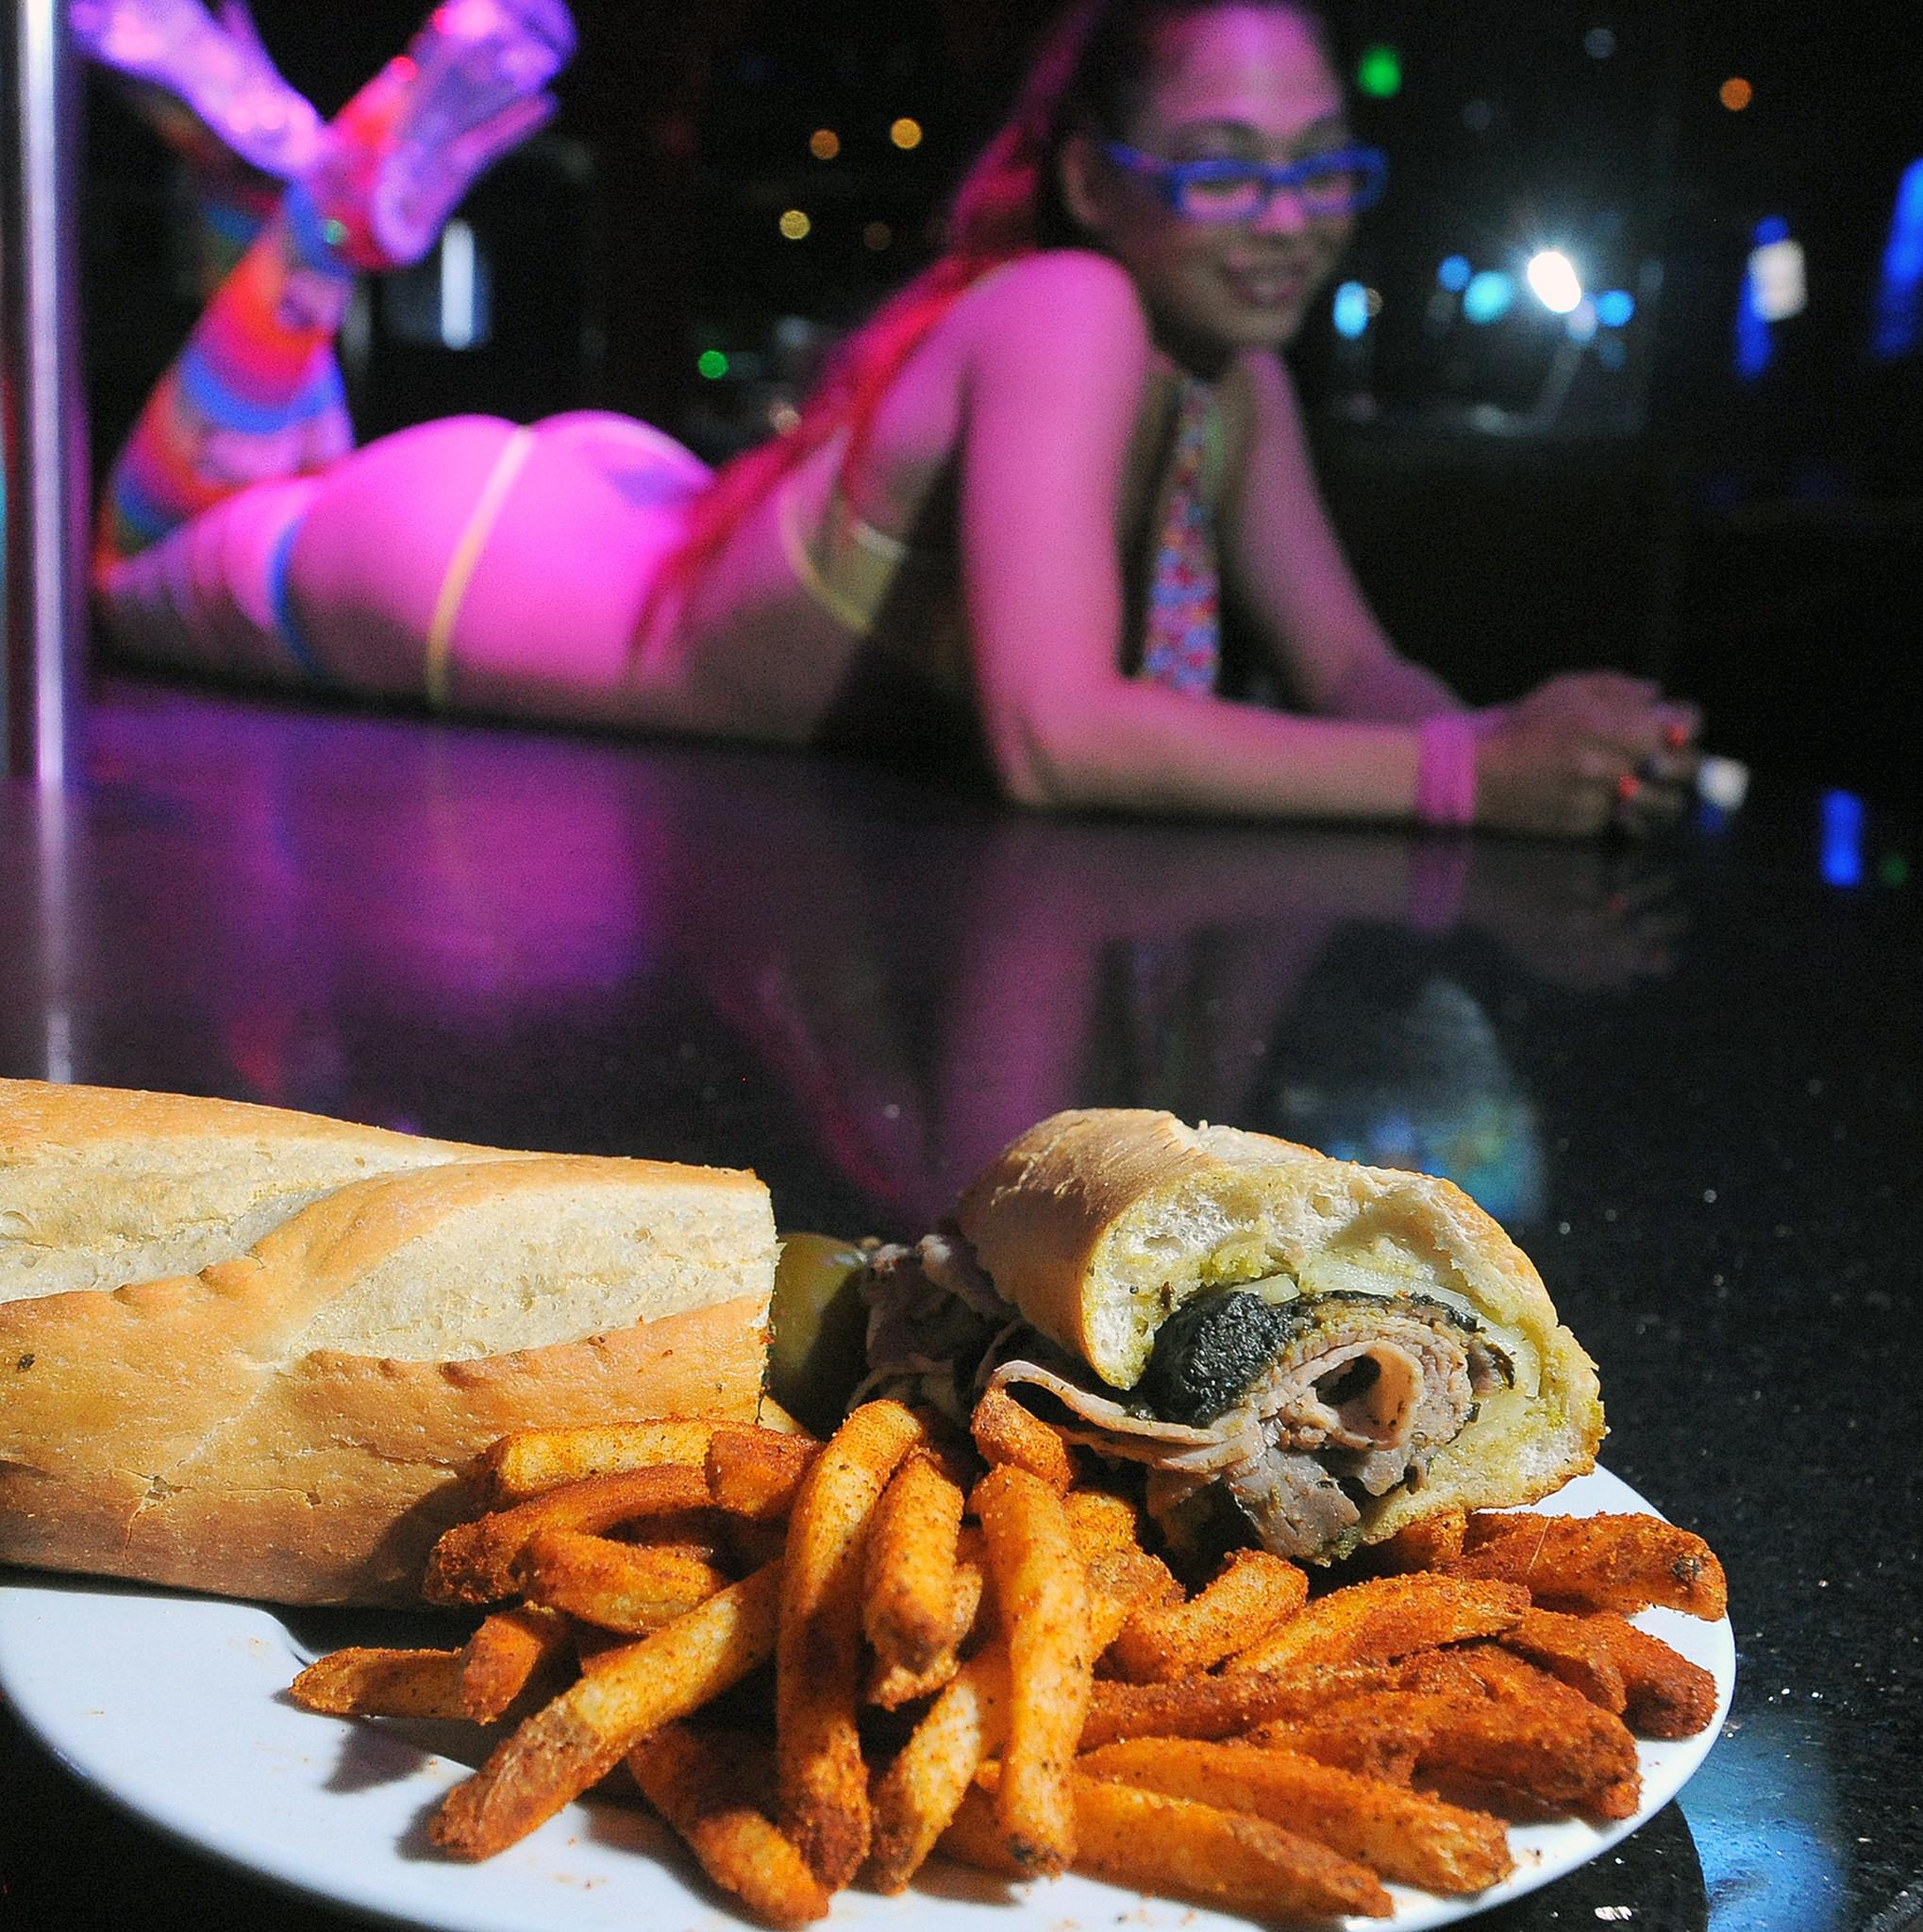 Baltimore strip club food [Pictures] - Strip club food